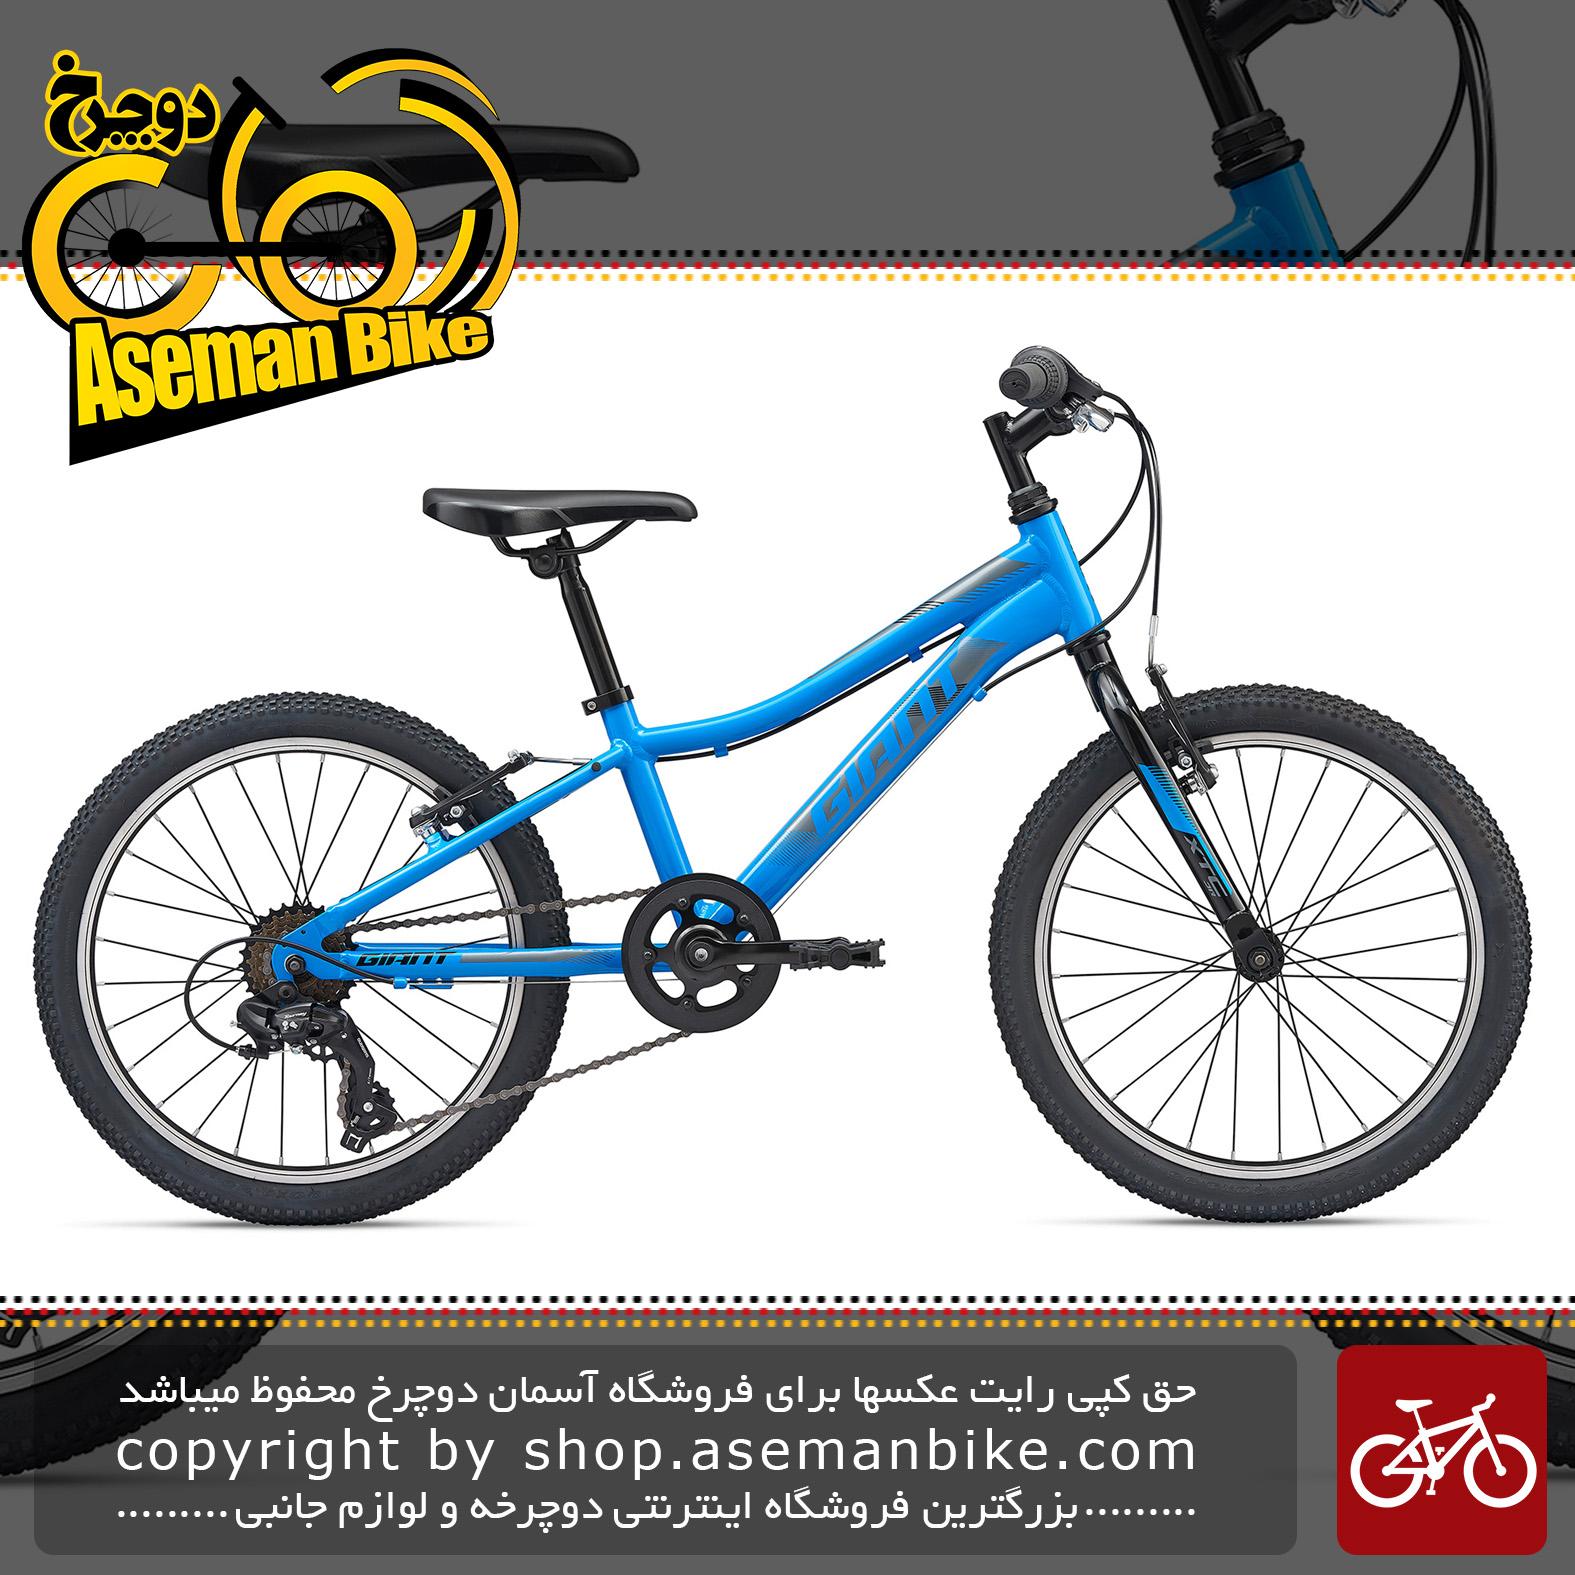 دوچرخه کوهستان جاینت مدل ایکس تی سی جی آر 20 اینچ لیت 2020 Giant Mountain Bicycle XTC Jr 20 Lite 2020